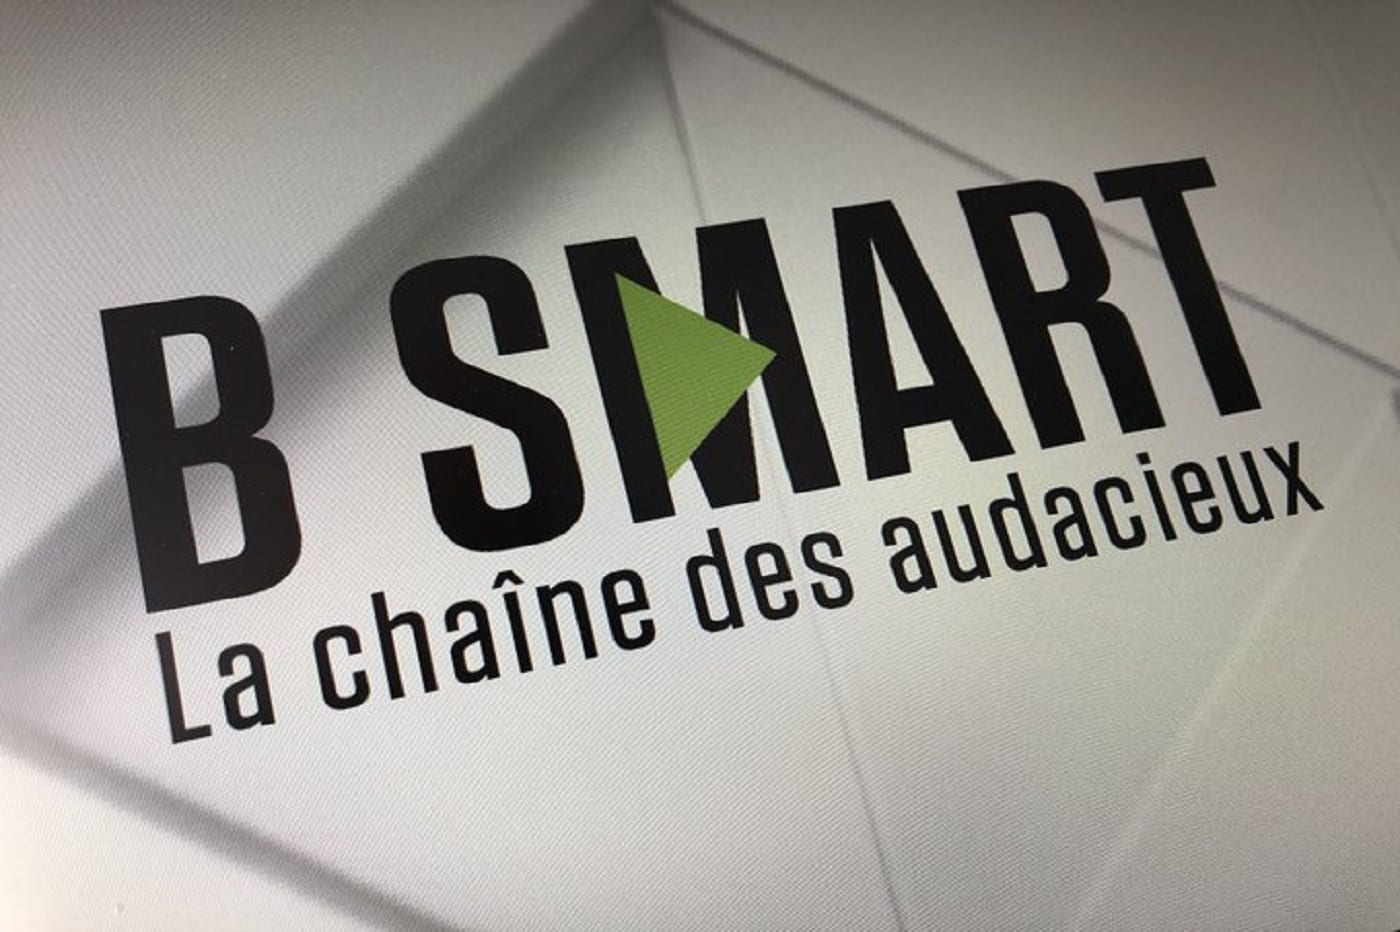 logo-besmart